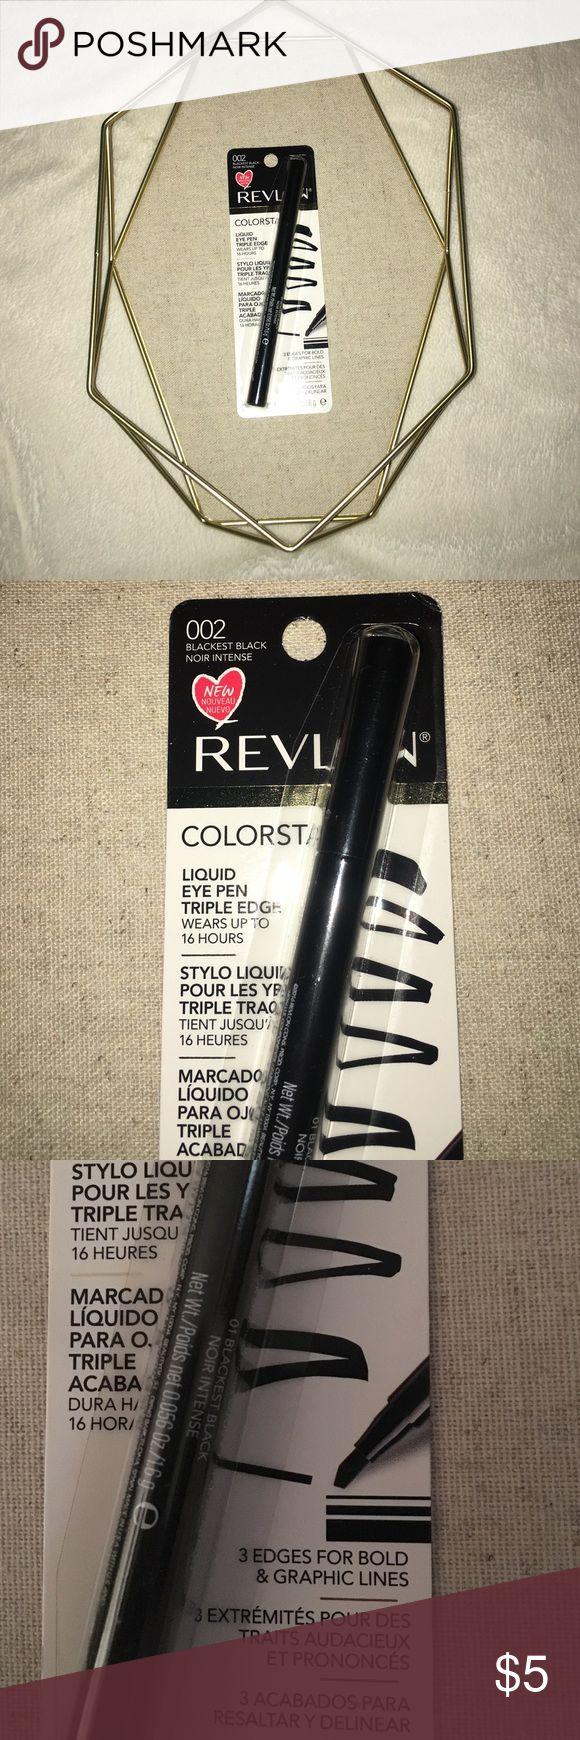 Revlon Eyeliner Brand new. Blackest black. Eye pen. Price firm unless bundled. No trades. Revlon Makeup Eyeliner